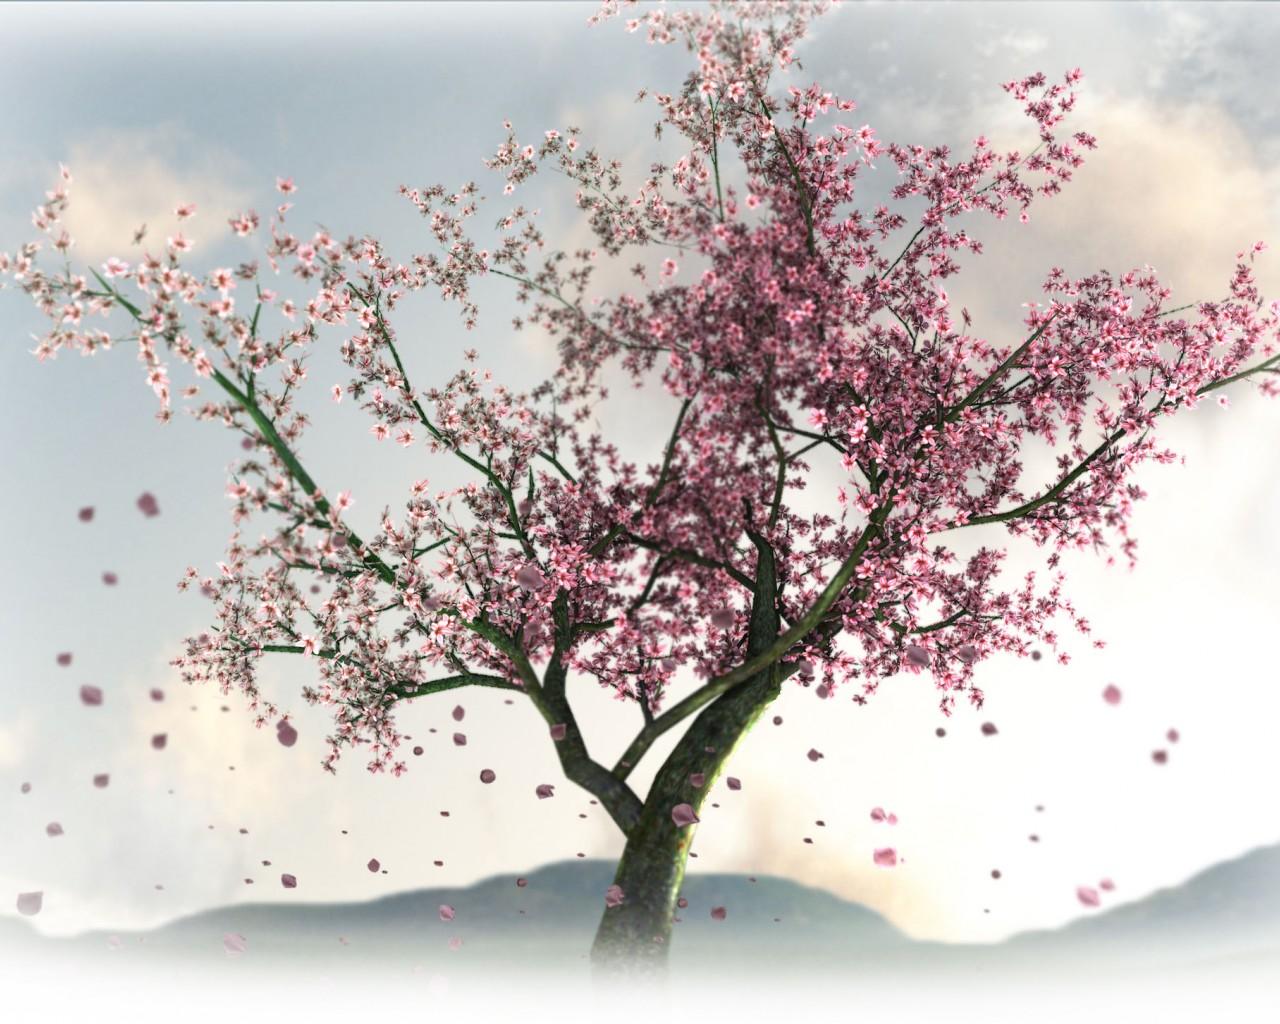 цветущая сакура сакура добавил silvery 2011 ...: zastavki.com/rus/nature/other/wallpaper-28425-10.htm